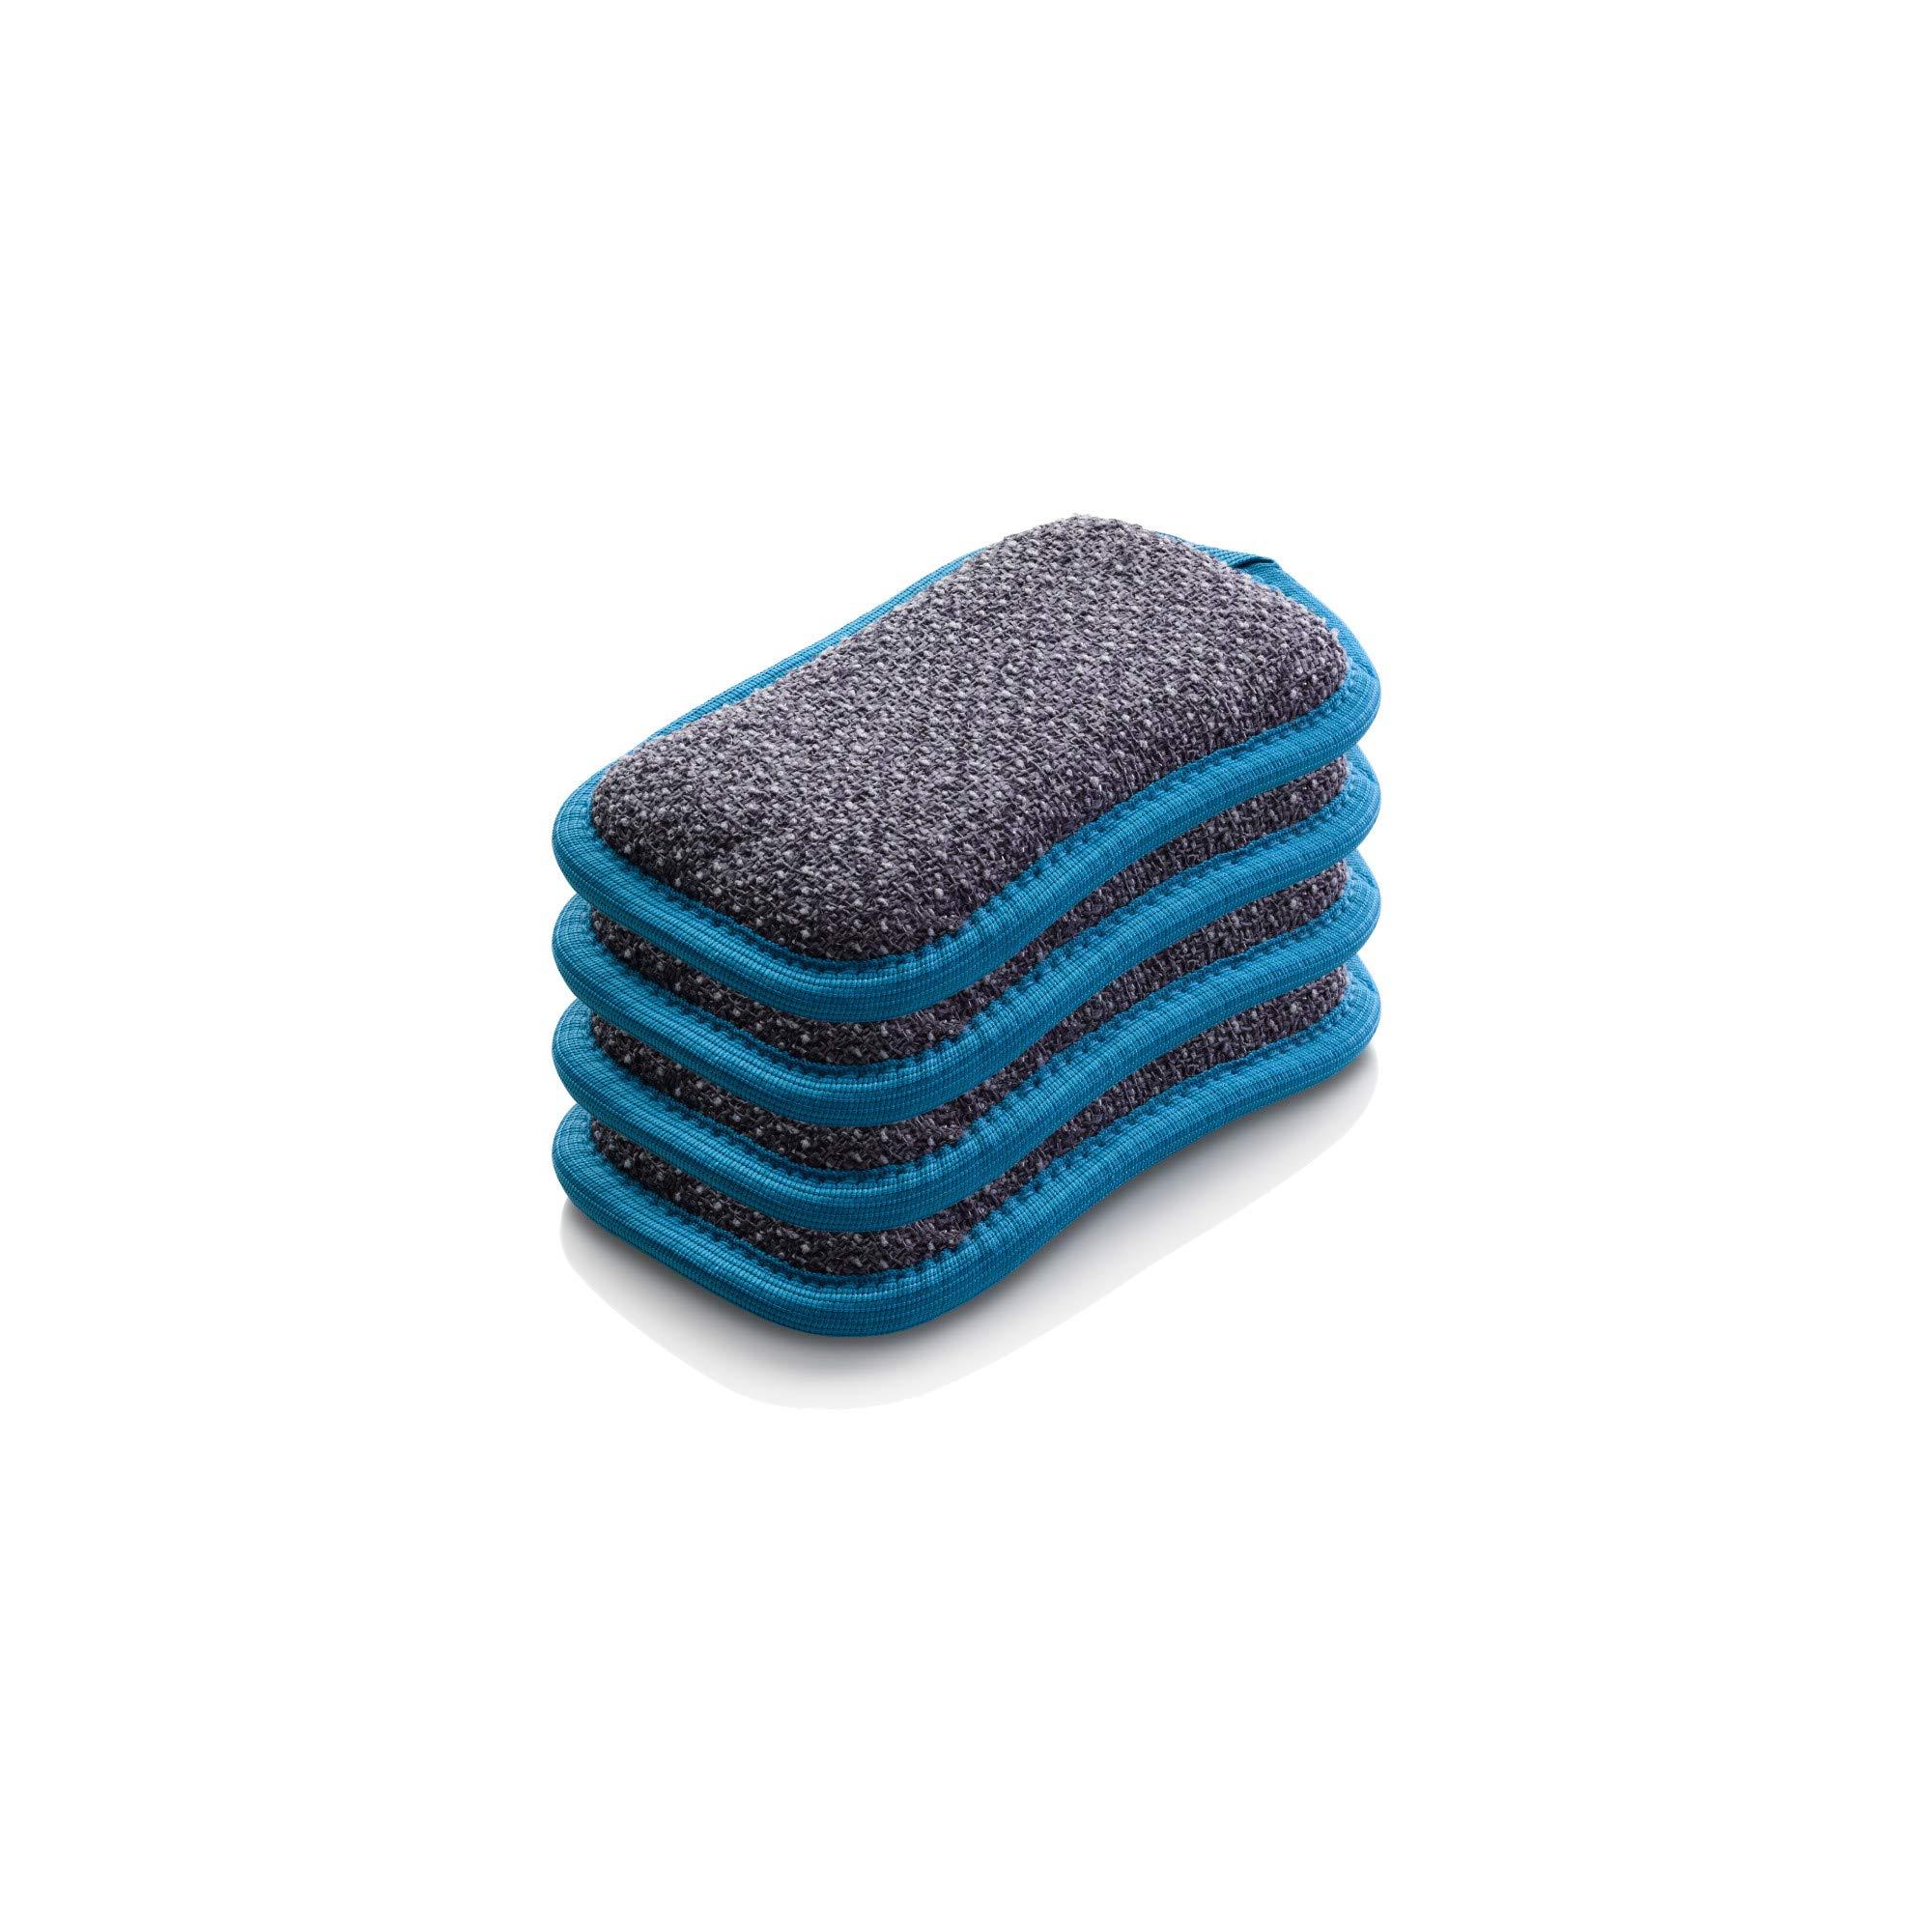 E-Cloth Microfiber Dual Purpose Washing Up Pad, Blue, 4 Count by E-Cloth